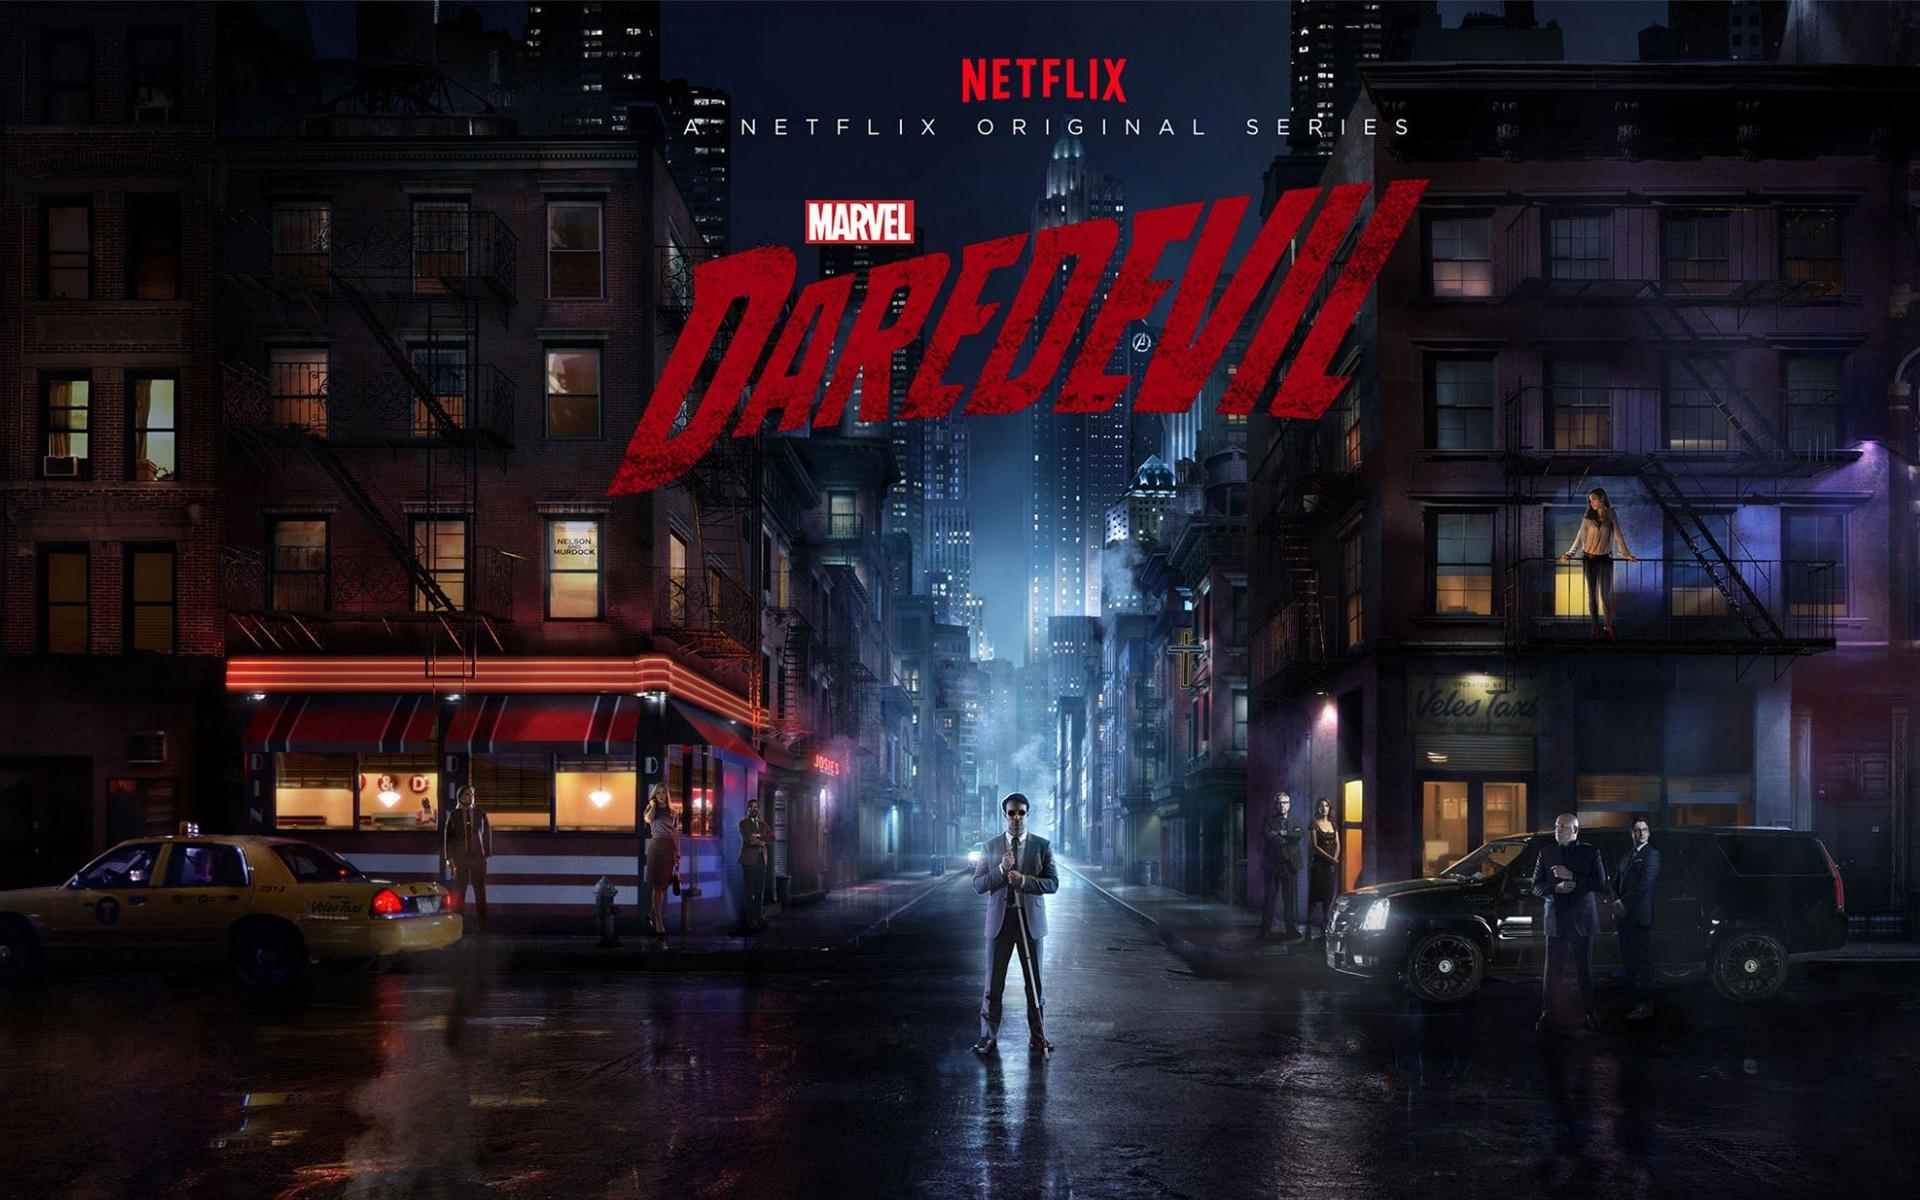 Daredevil 2015 TV Series Wallpapers HD Wallpapers 1920x1200